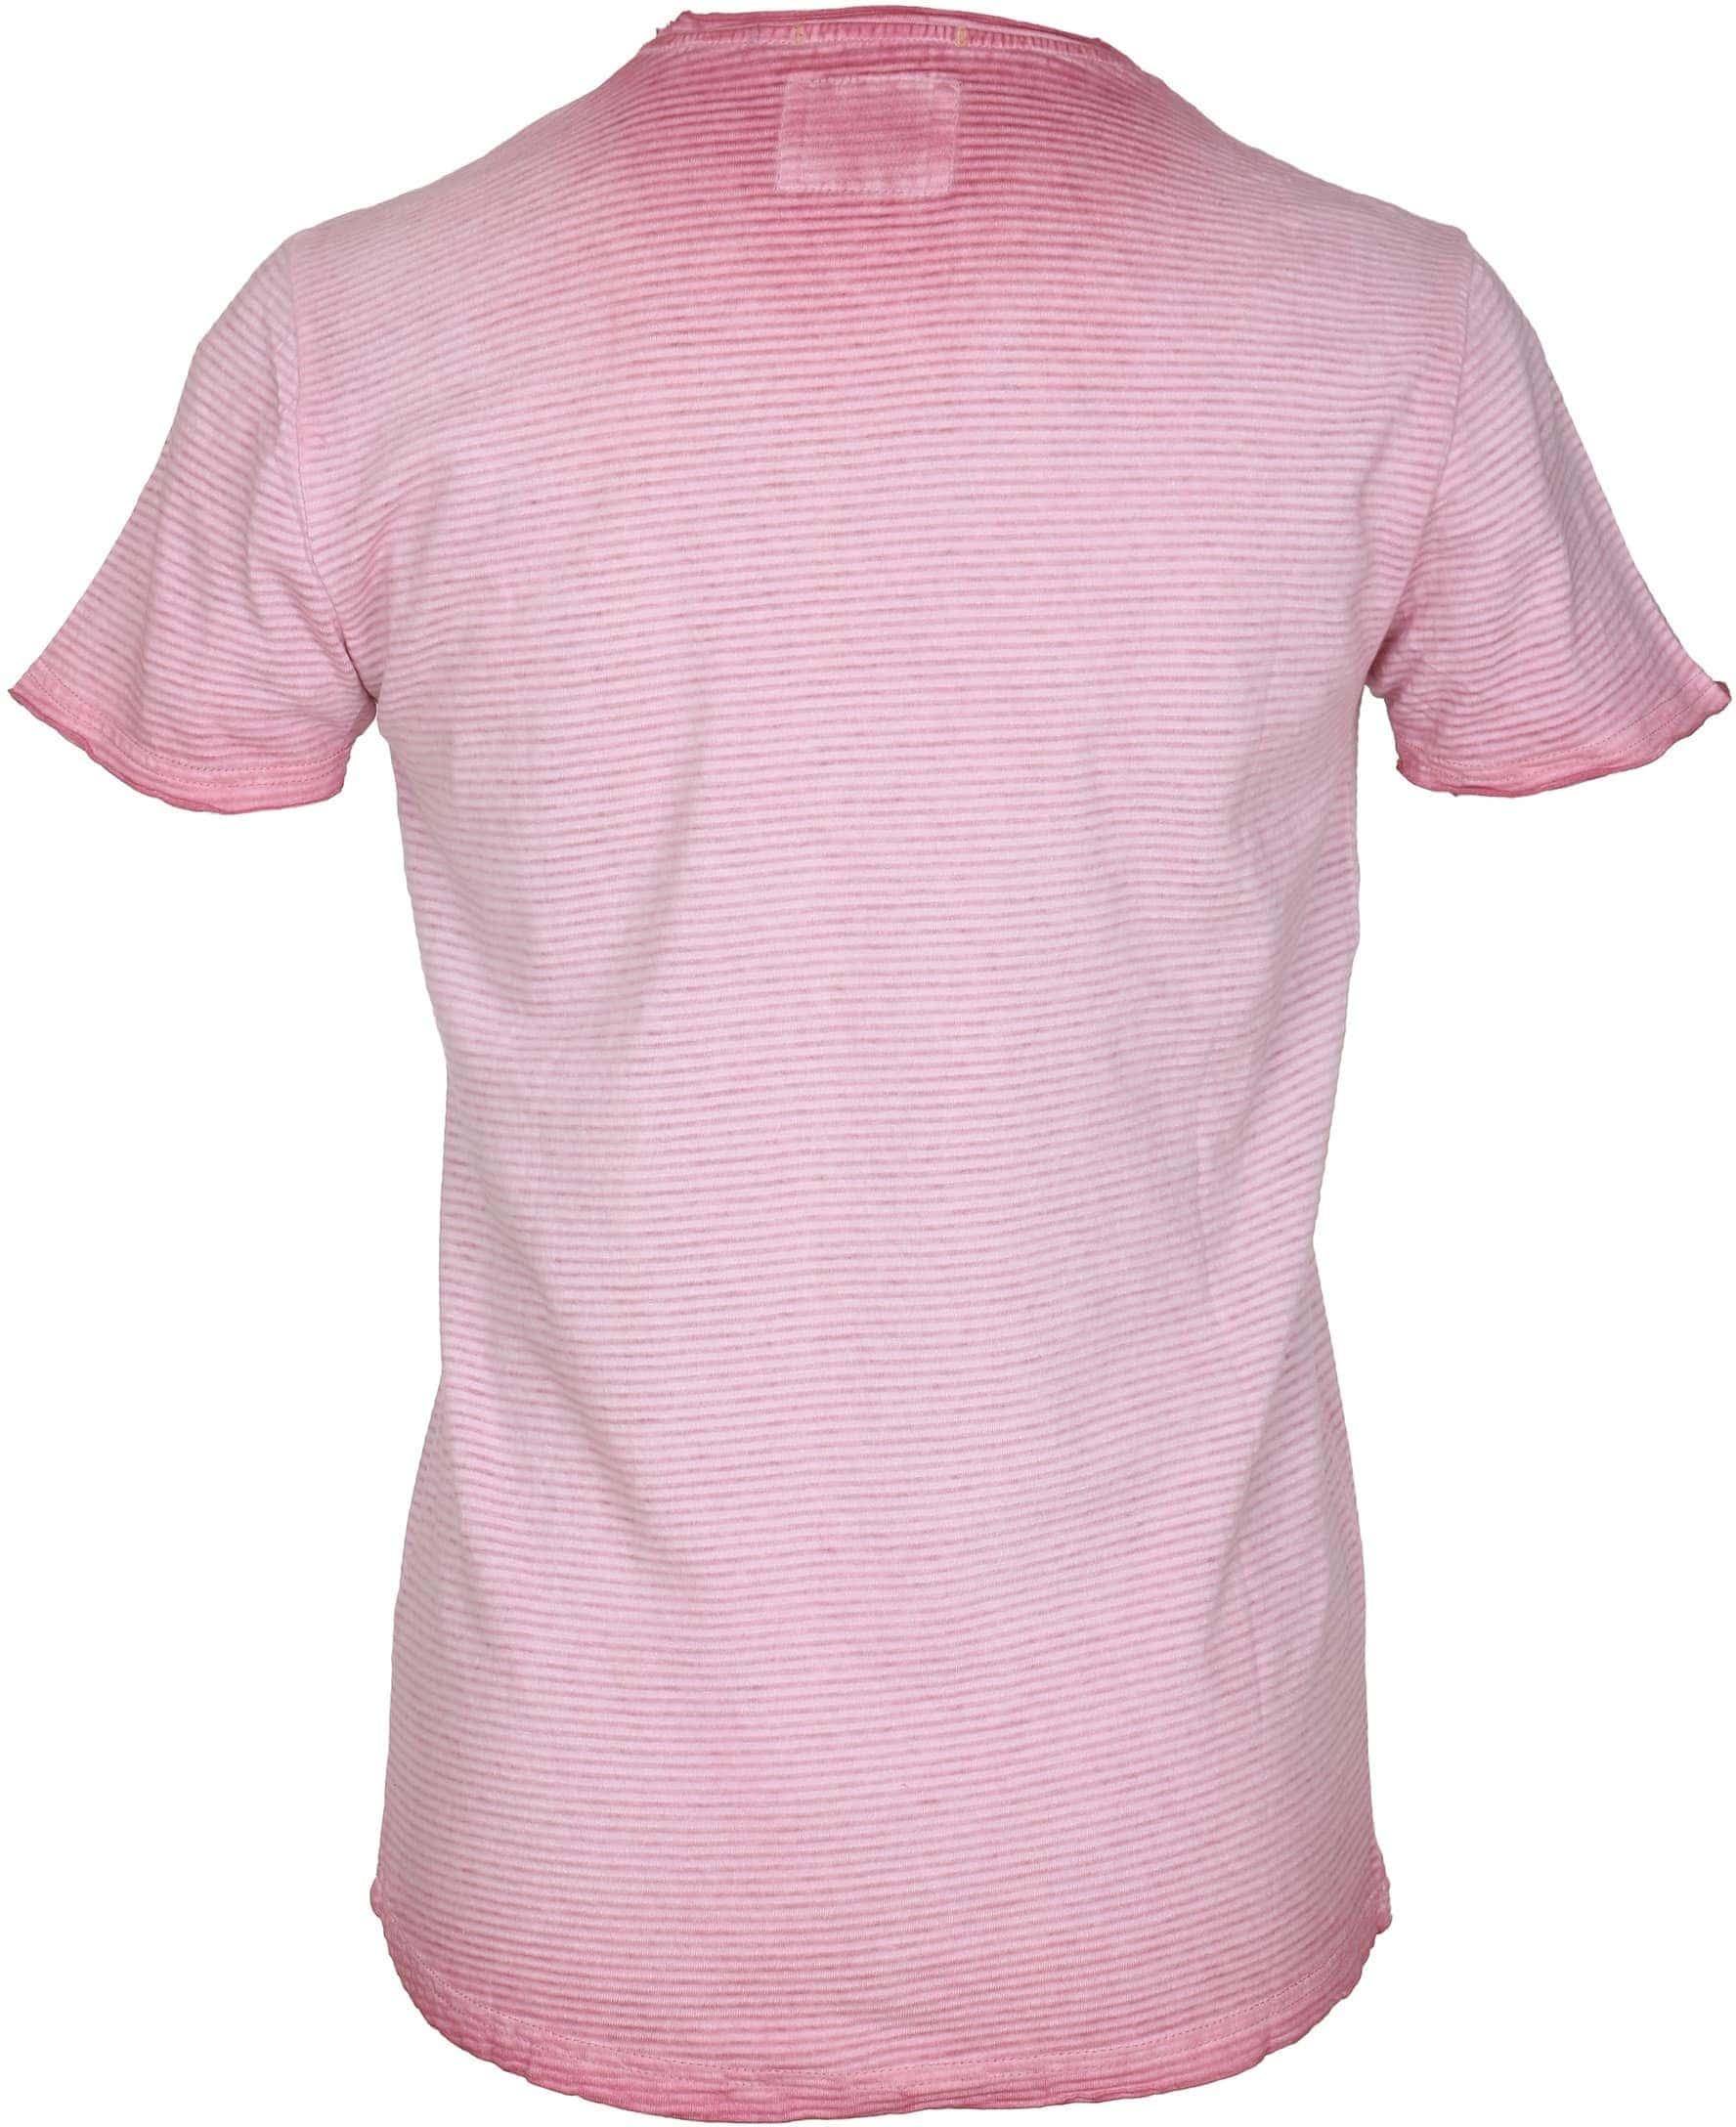 No-Excess T-shirt Rosa Streifen foto 2